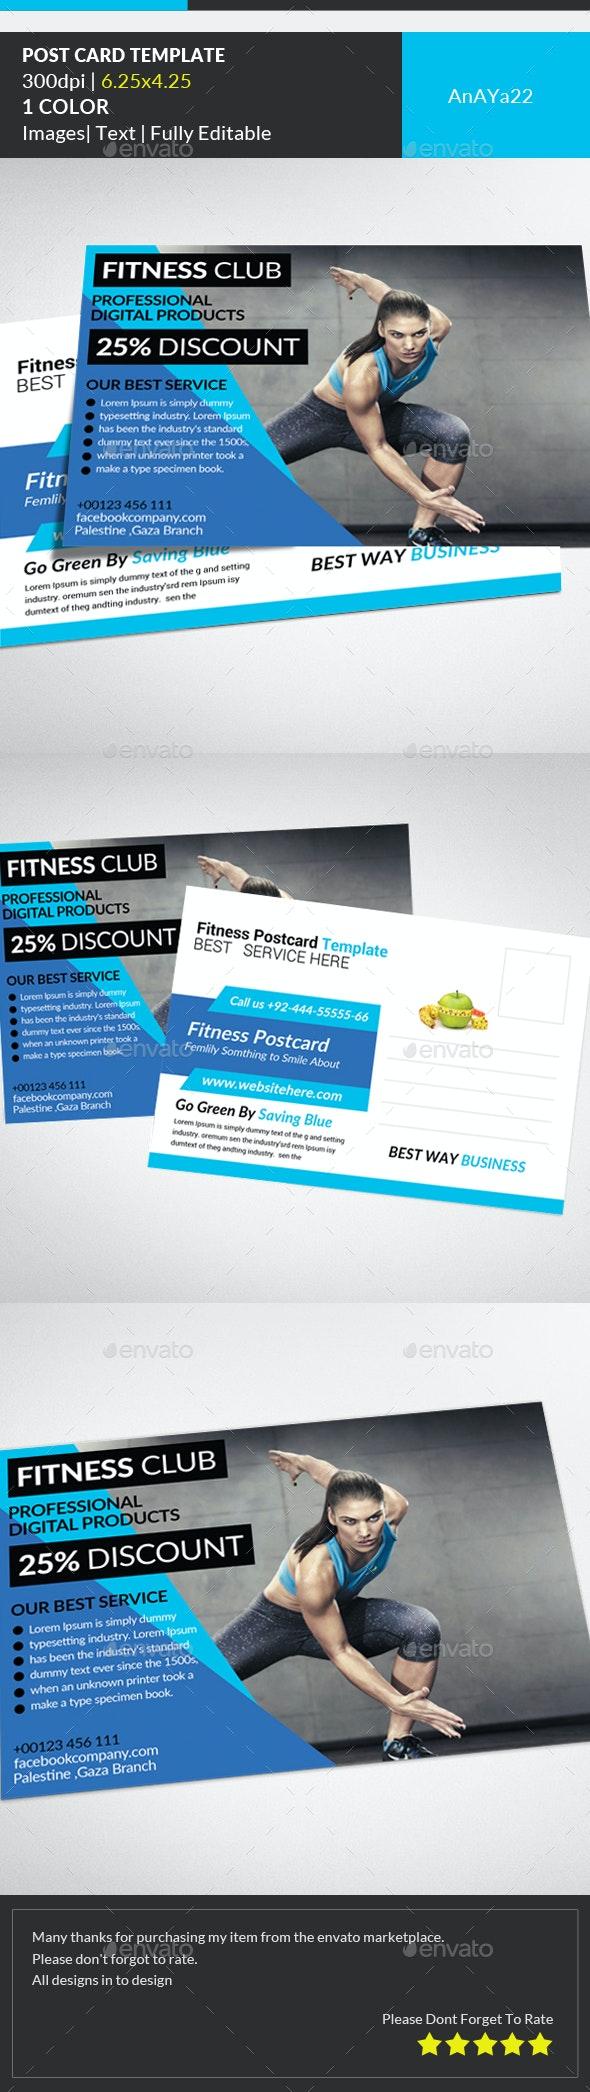 Fitness Postcard Psd Template - Cards & Invites Print Templates